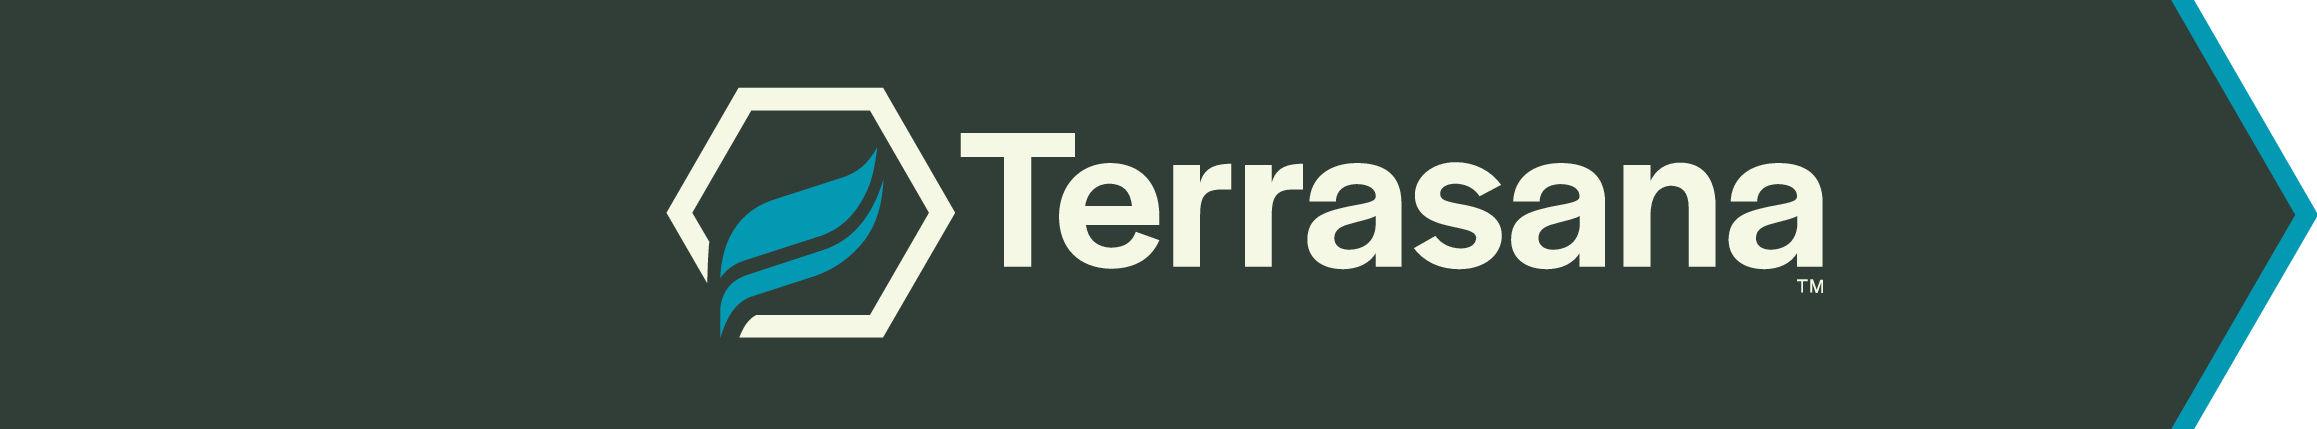 Terrasana Logo 1